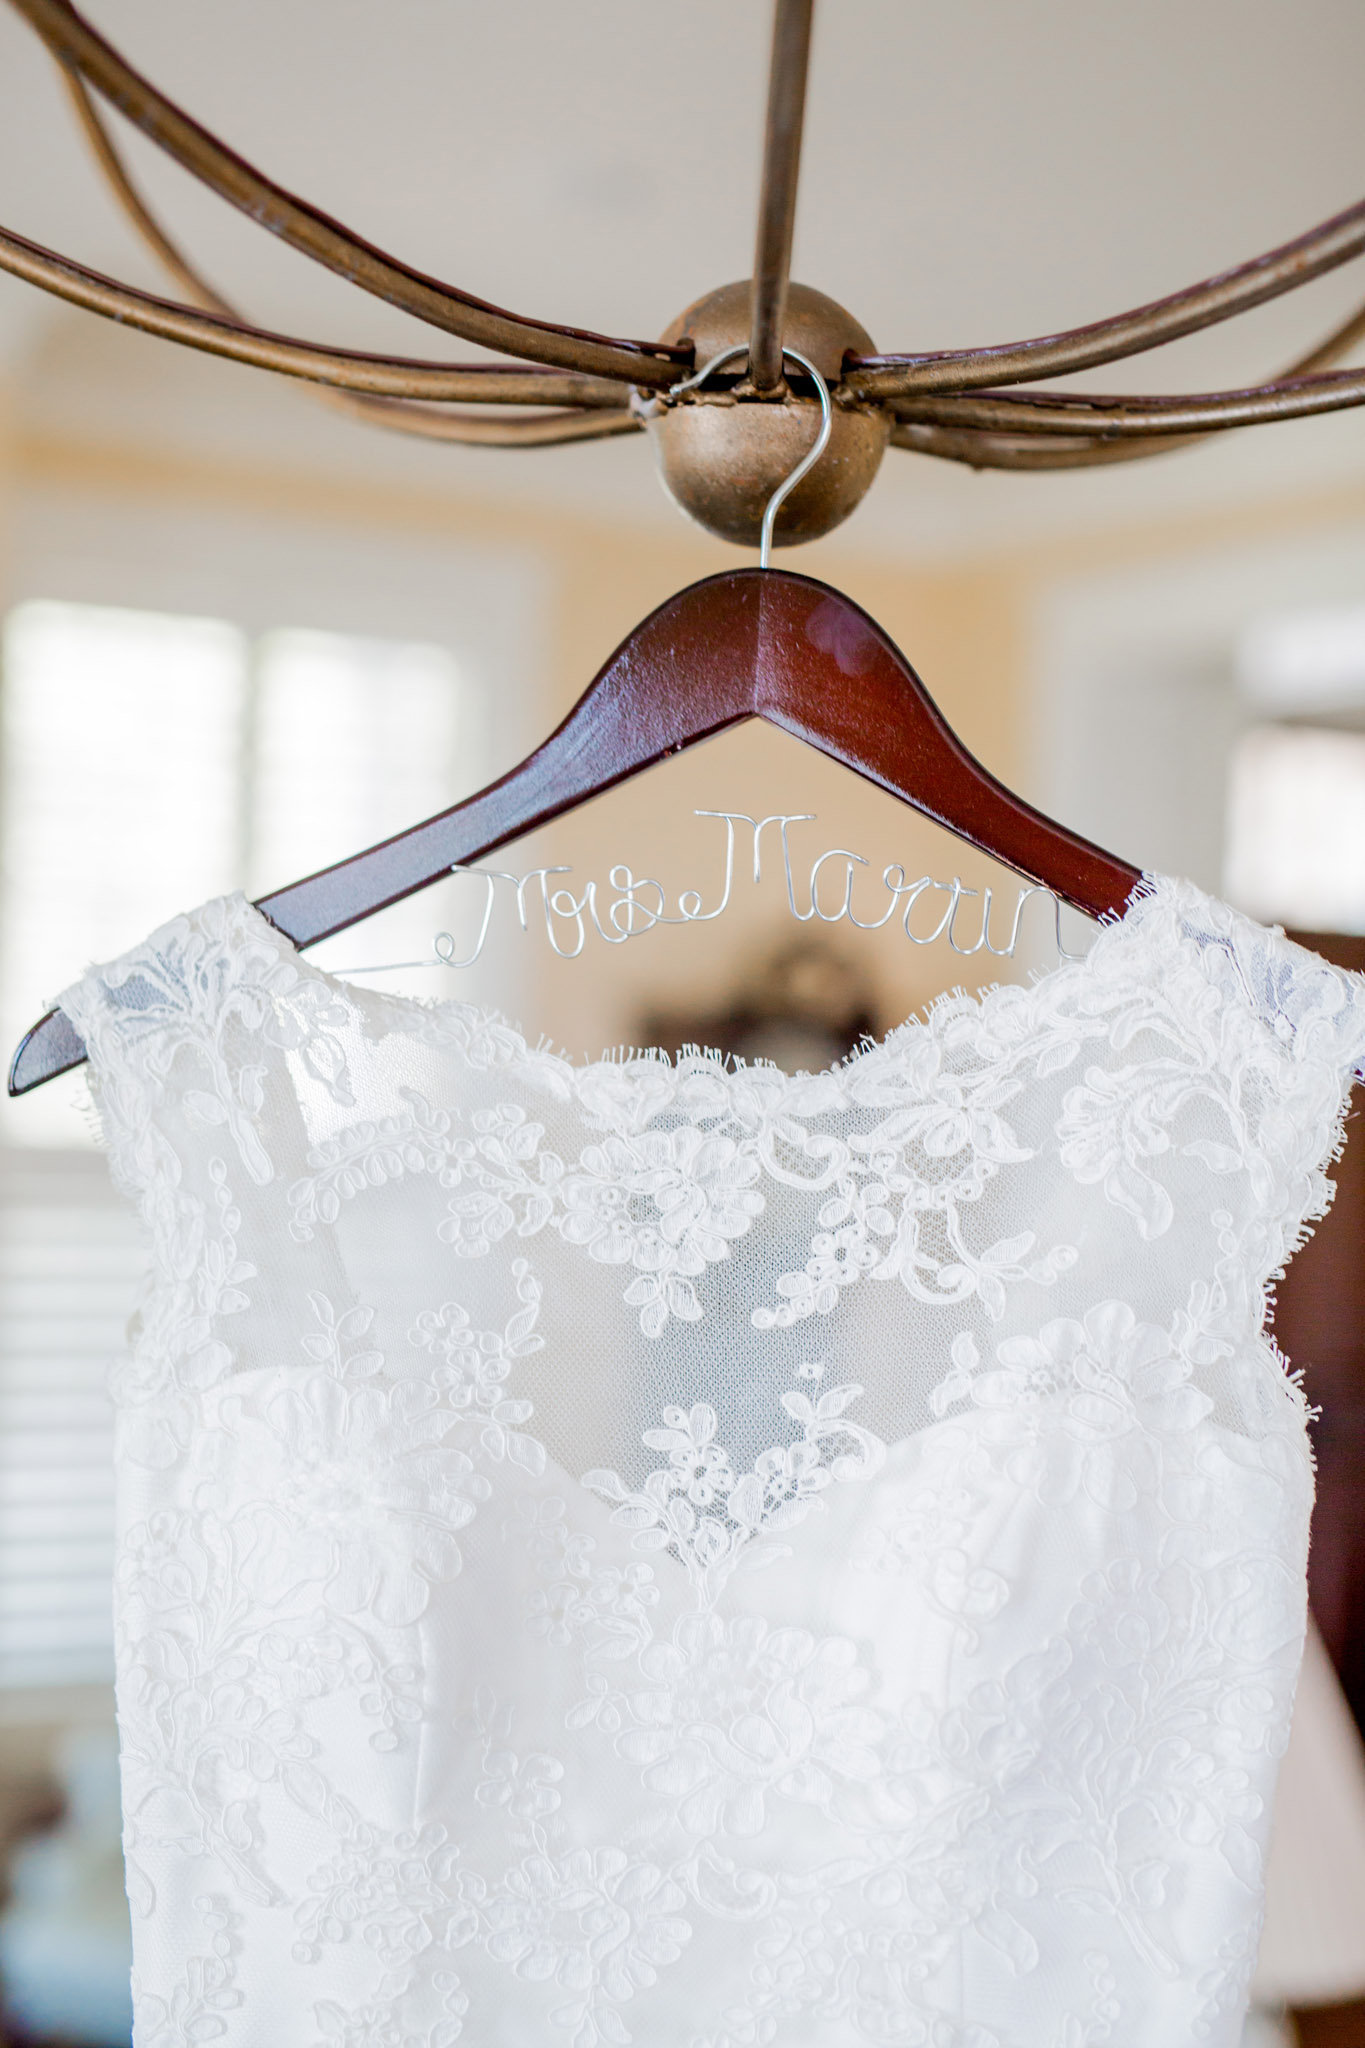 Paloma Blanca dress at Beaufort, SC wedding